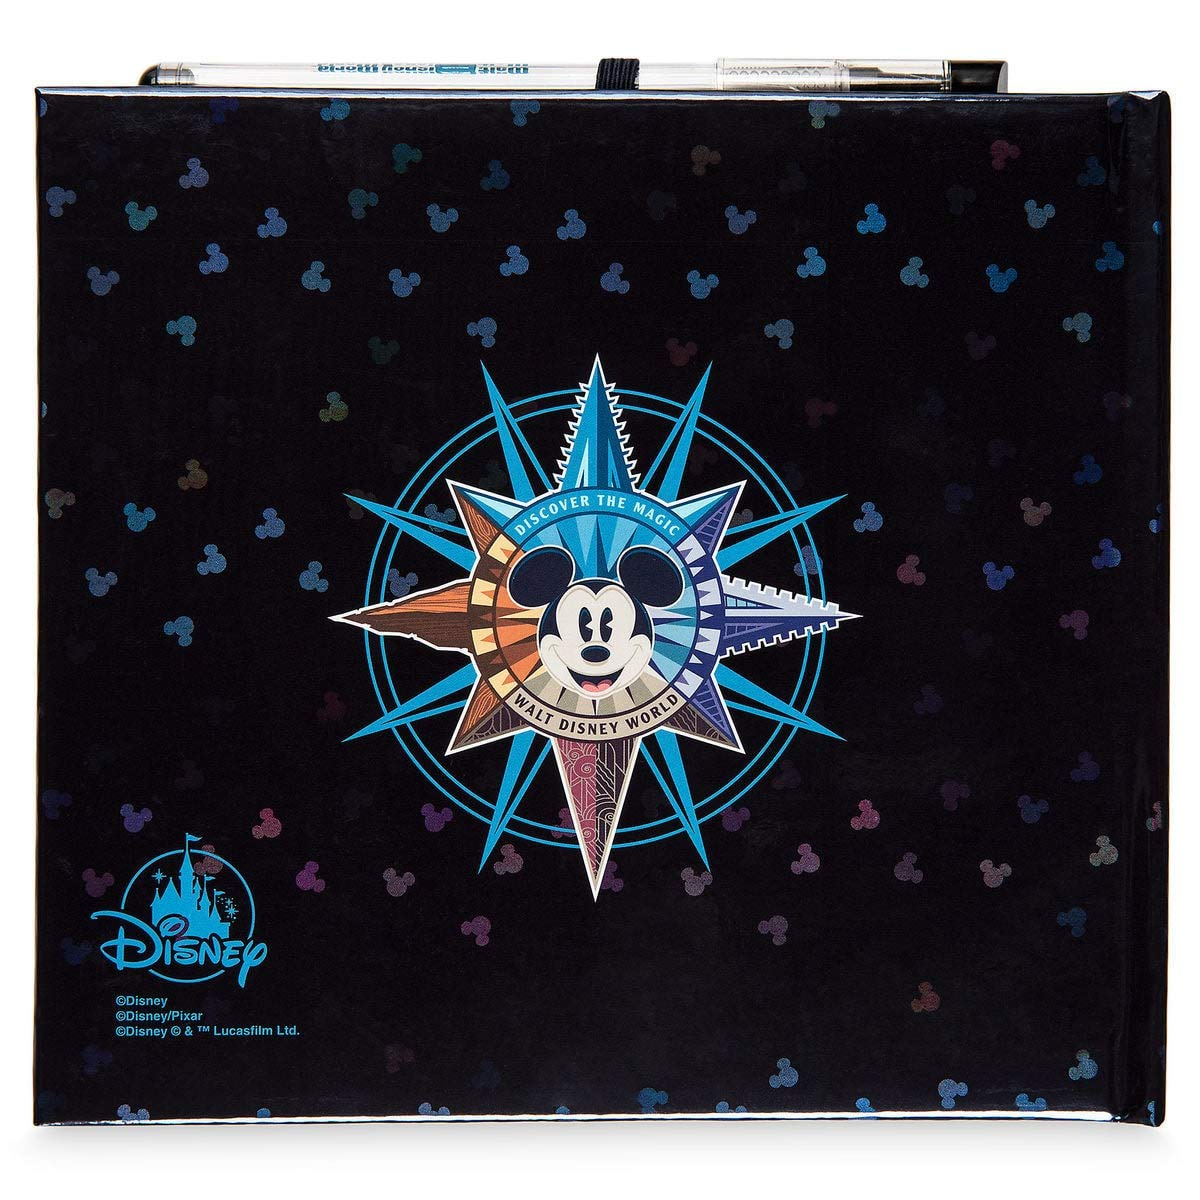 Disney World Discover the Magic Autograph//Photo Book